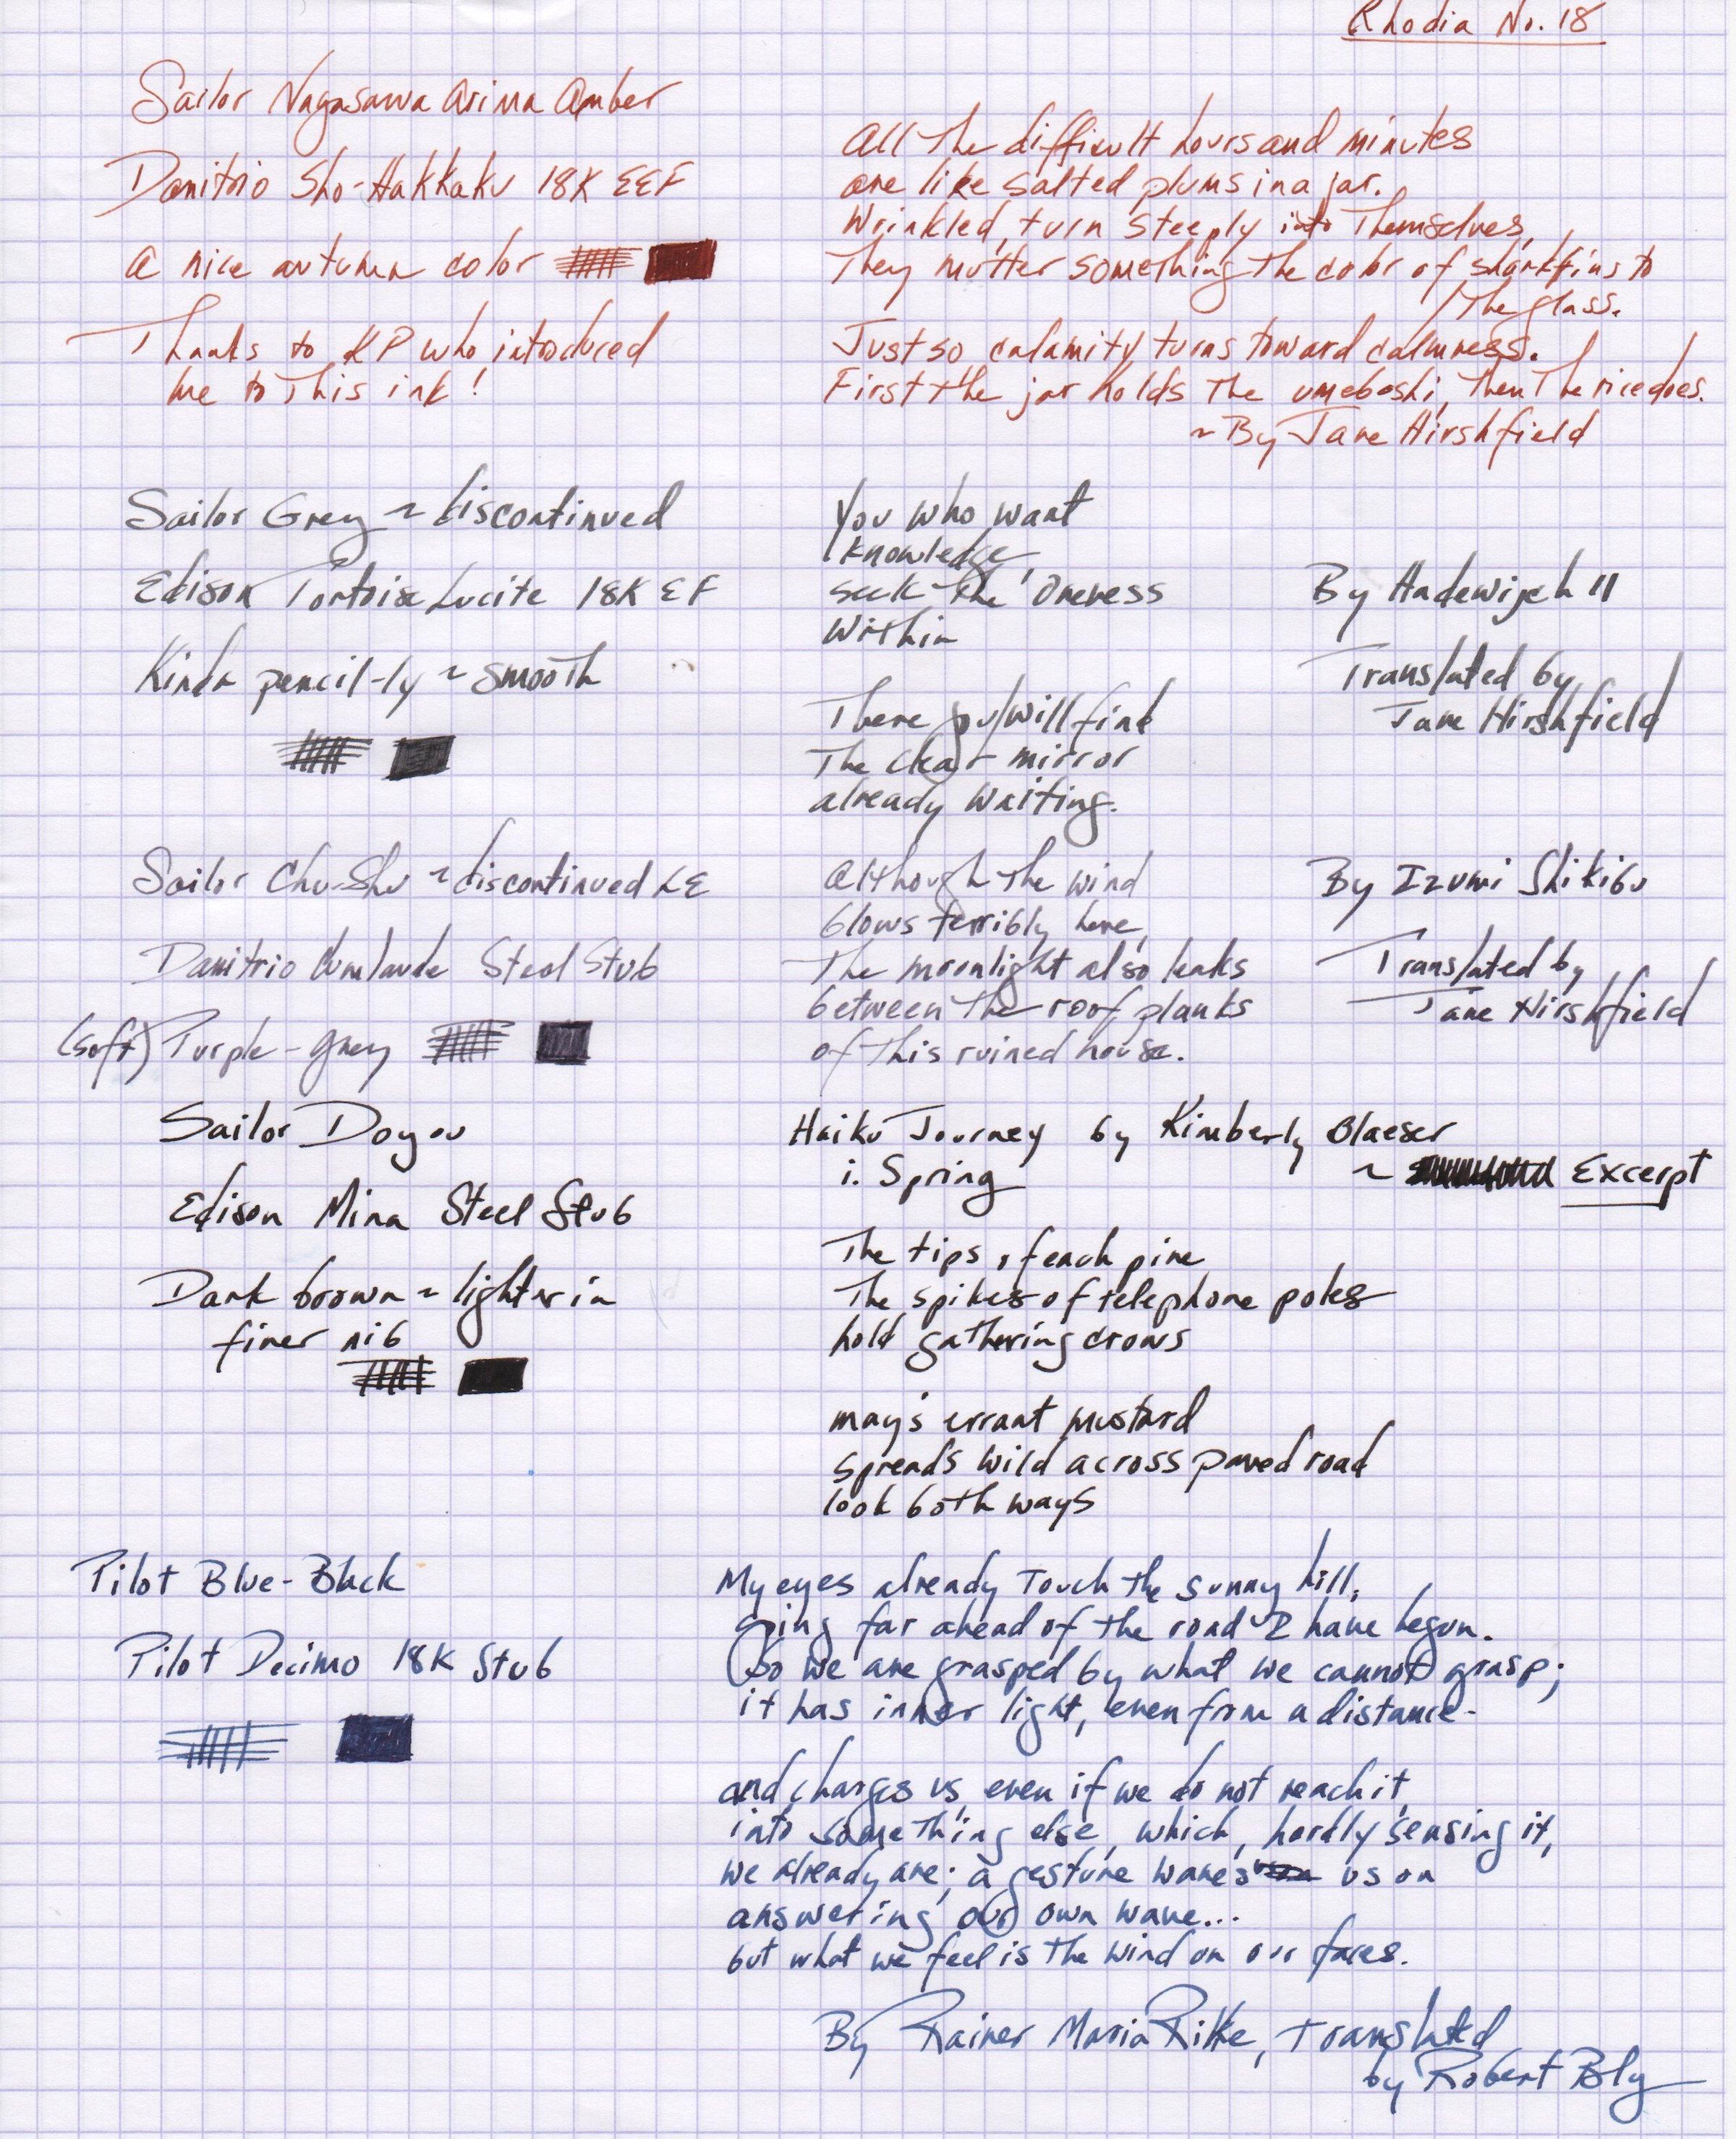 Praperation of msc thesis acomplete plane of study